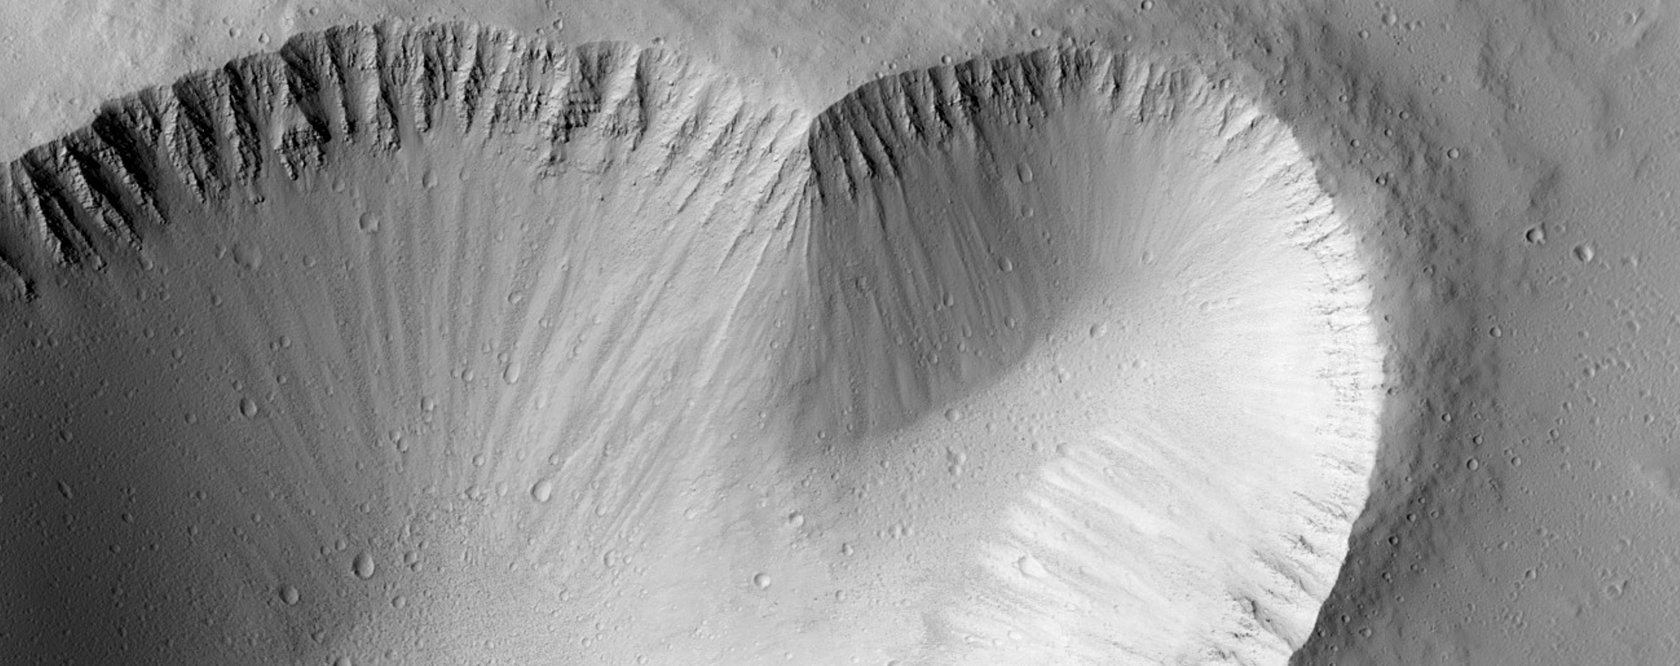 5-Kilometer Crater Near Ascraeus Mons